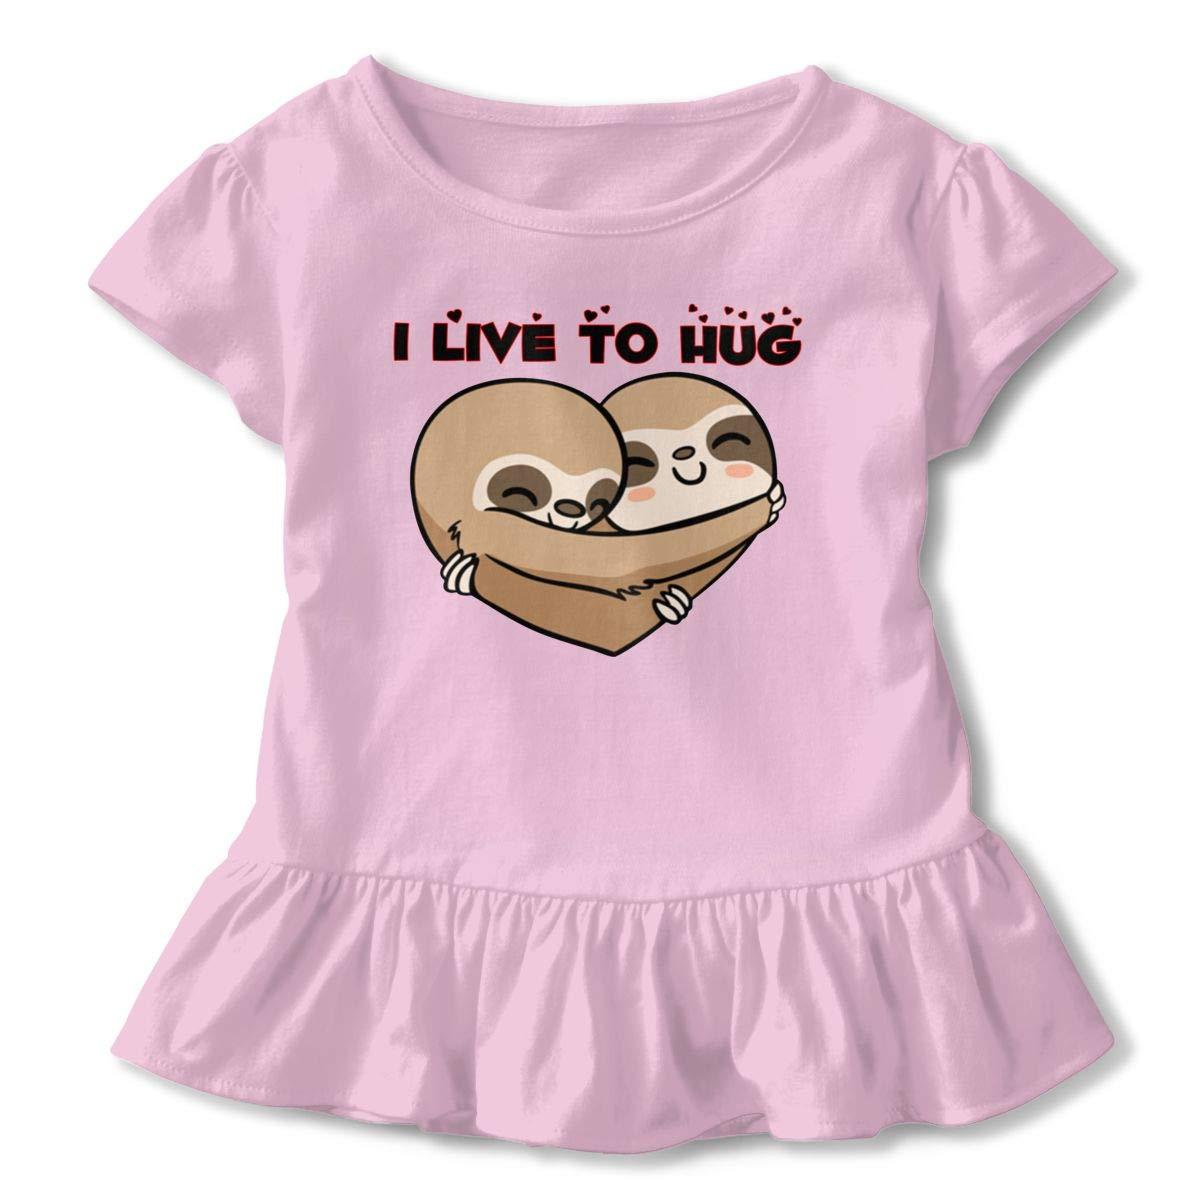 NMDJC CCQ I Live to Hug Sloth Baby Skirts Cute Kids T Shirt Dress Comfortable Flounces Outfits